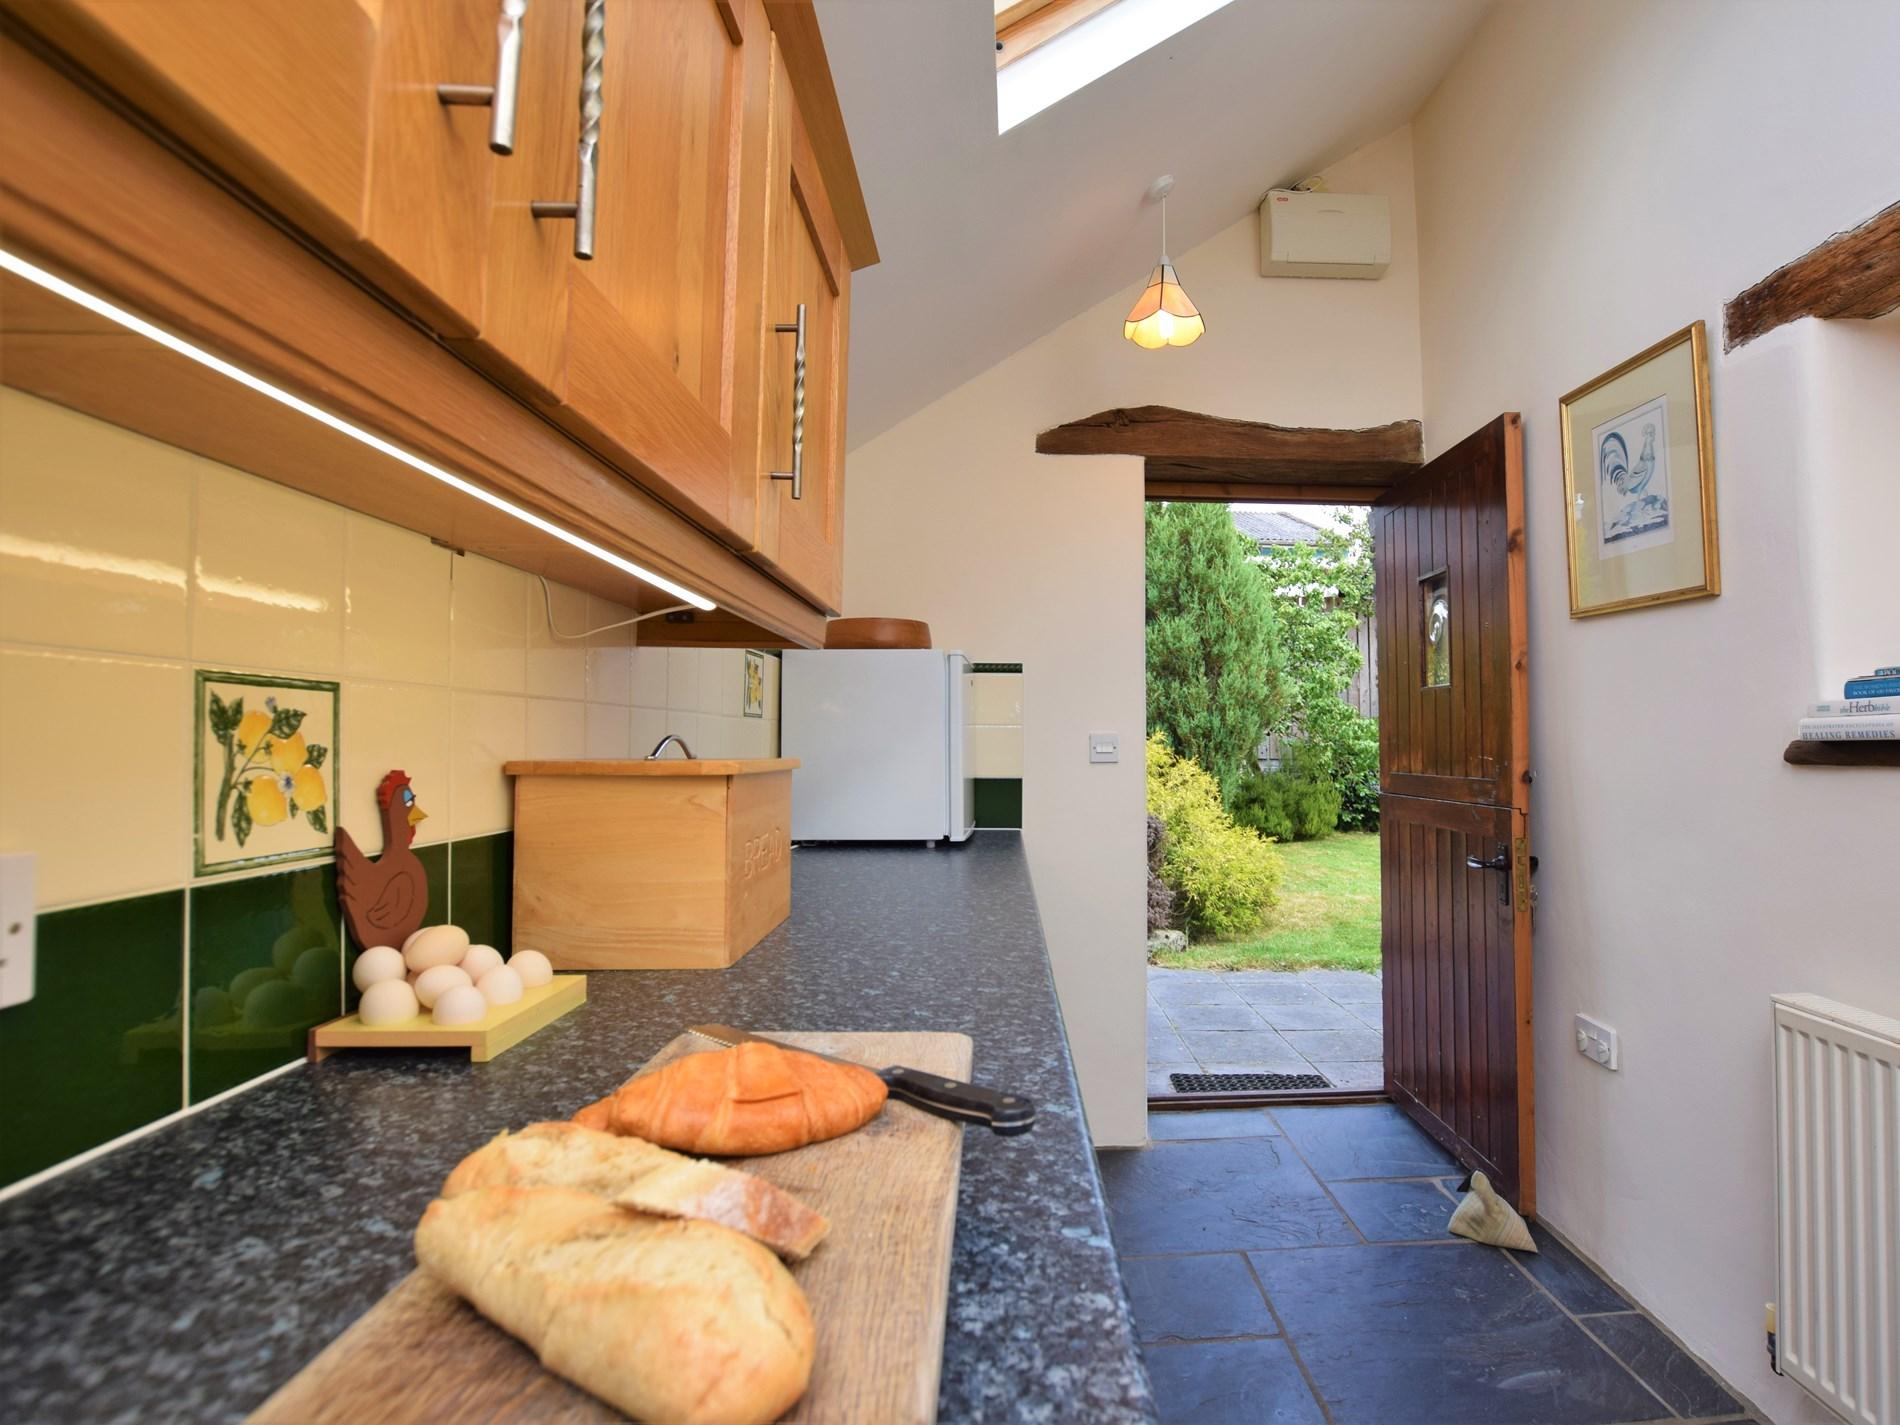 Kitchen with stable door to the garden